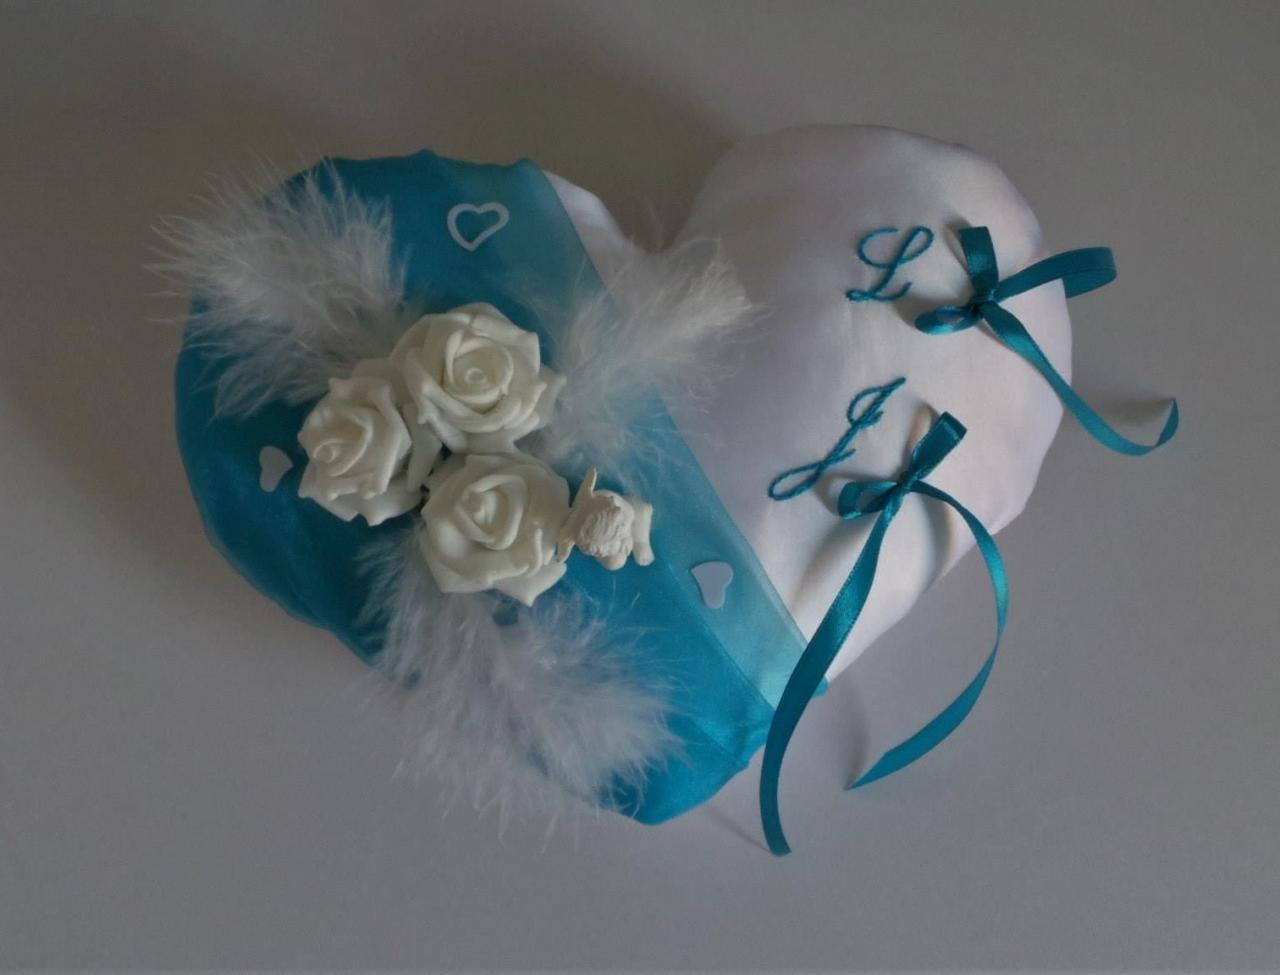 Coussin de mariage coeur turquoise